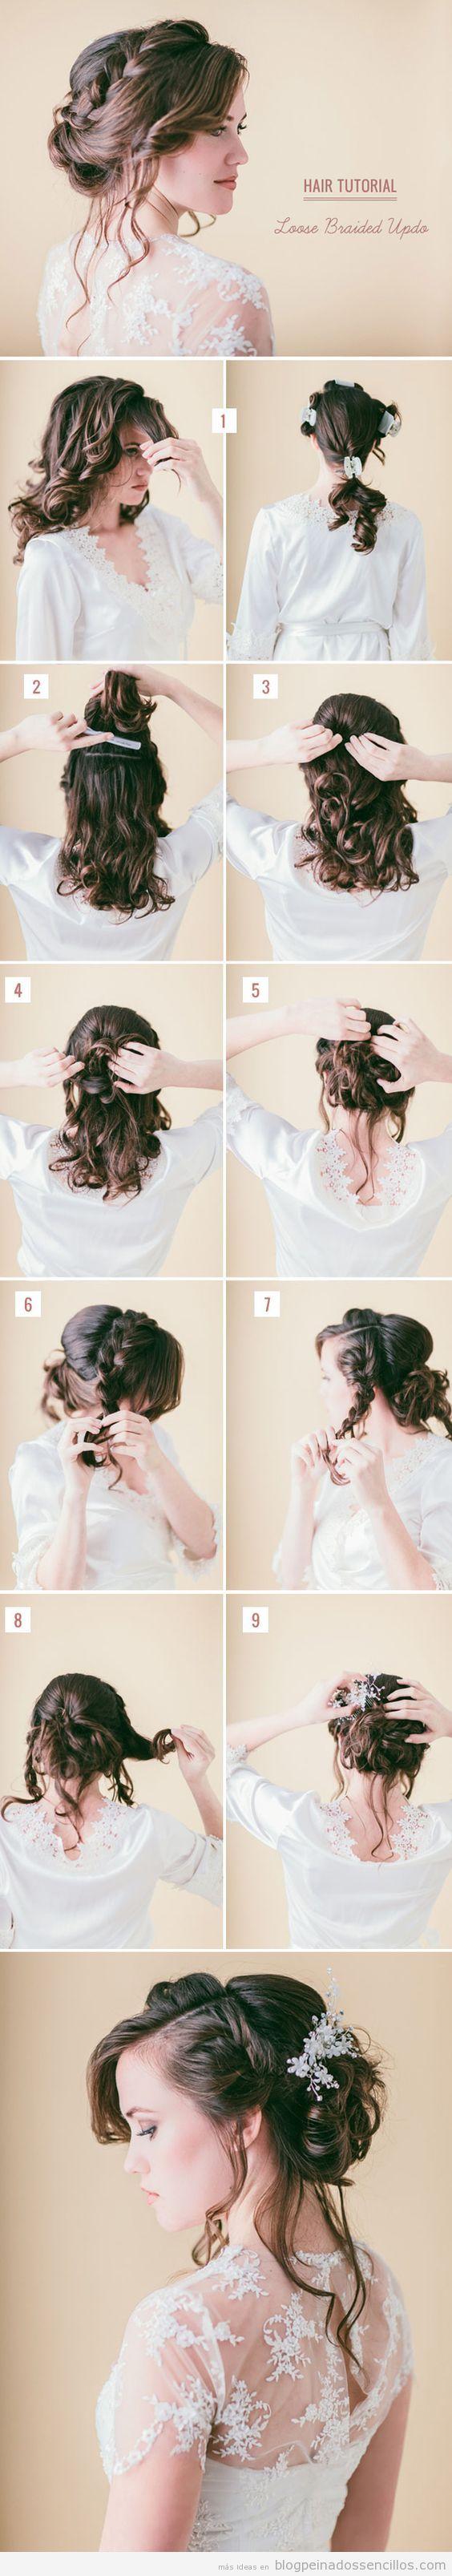 Peinados sencillos para novias a invitadas de boda, recogido boho 4